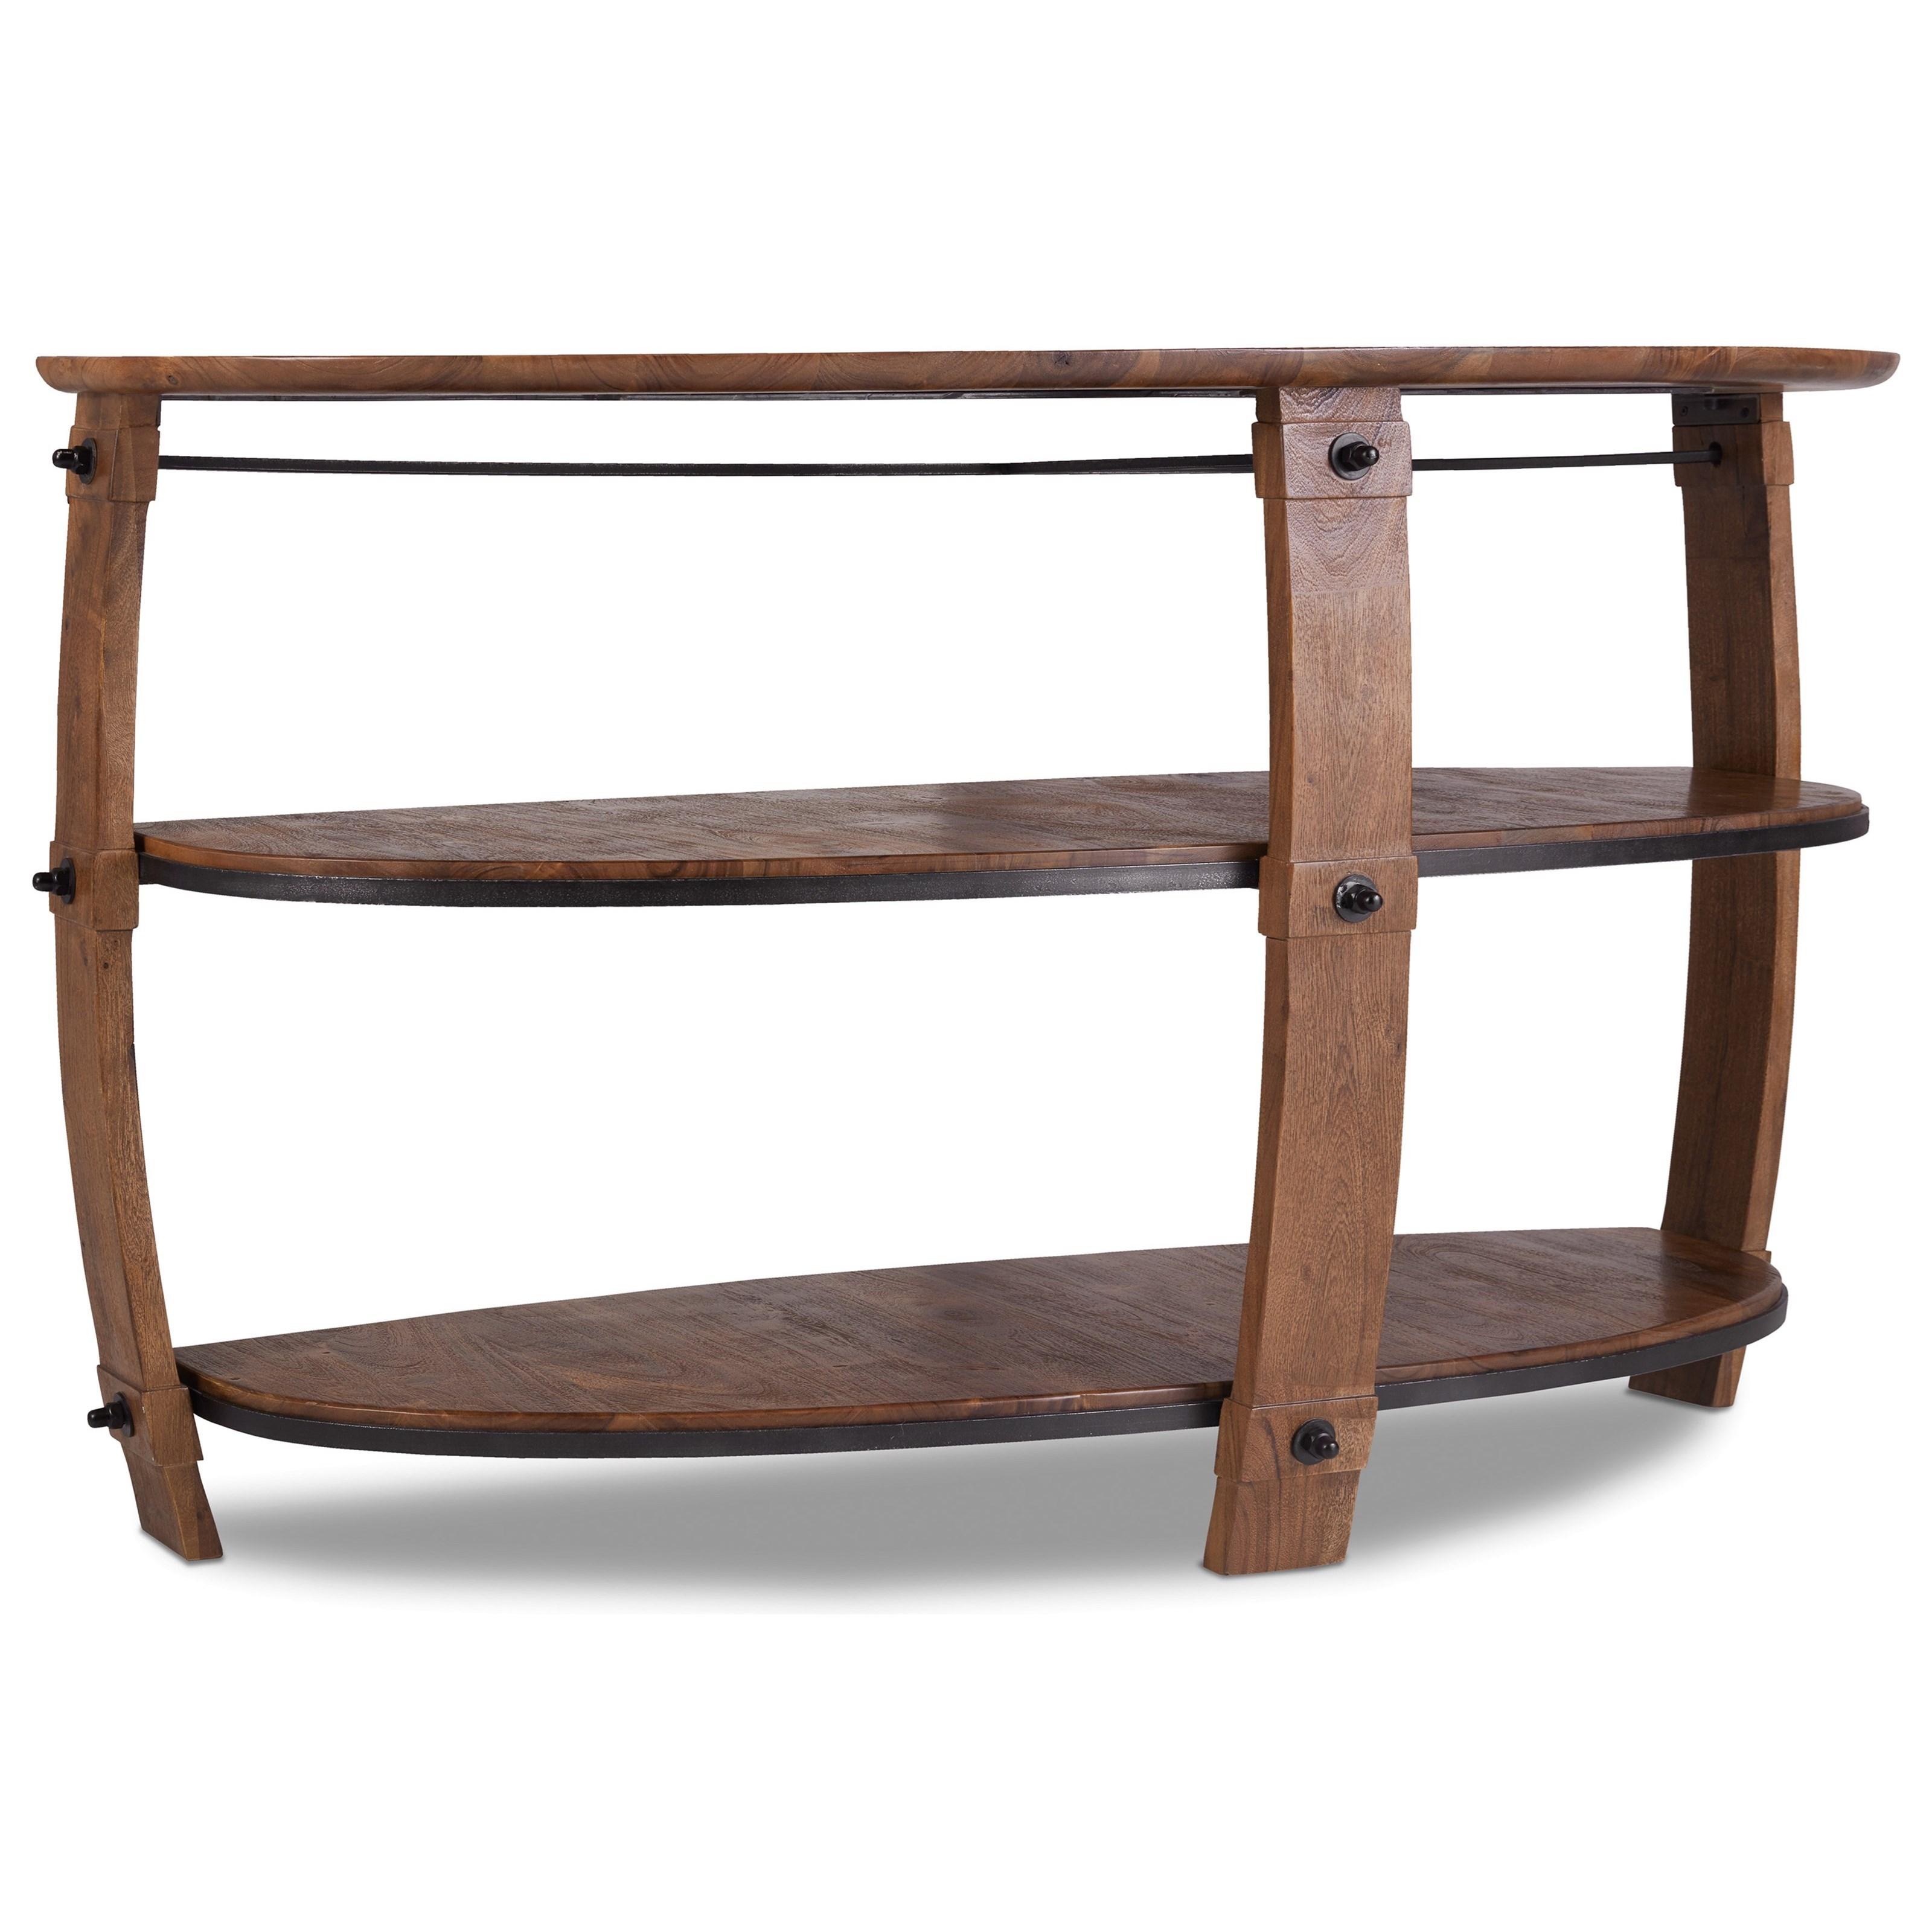 Hooker Furniture Glen Hurst Console Table - Item Number: 5513-80151-MWD